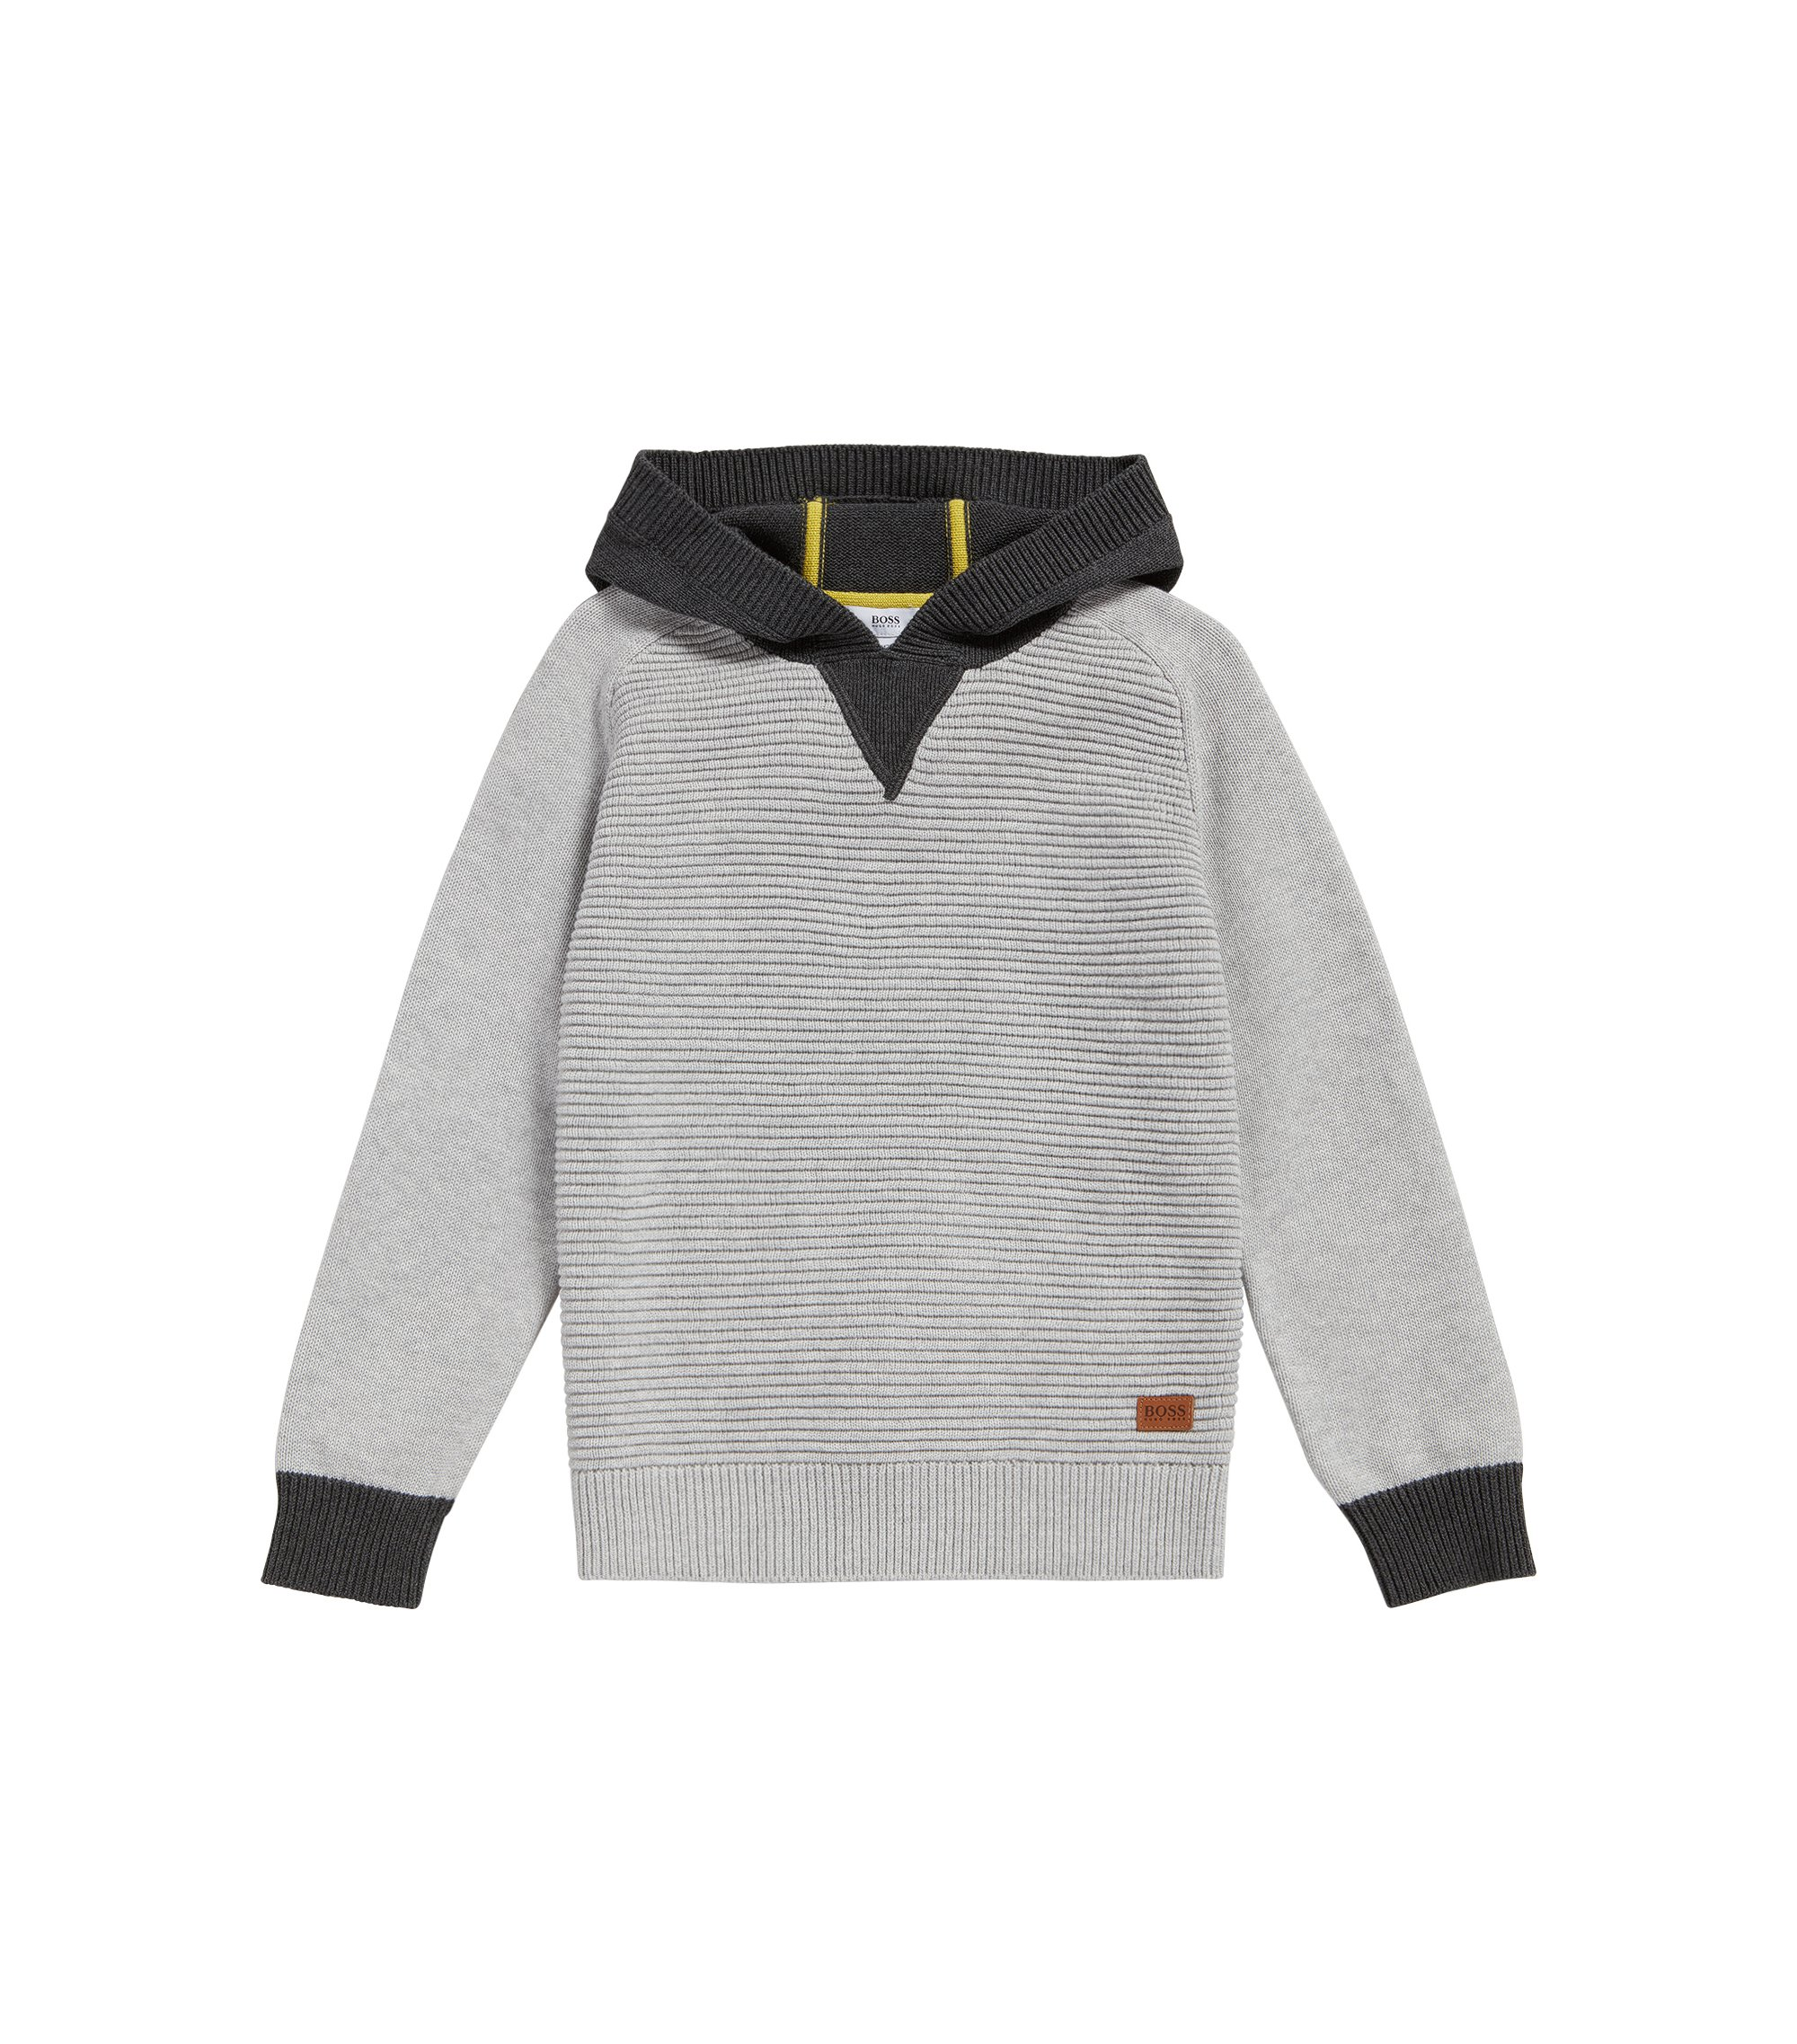 'J25A16' | Boys Cotton Hooded Sweater, Light Grey